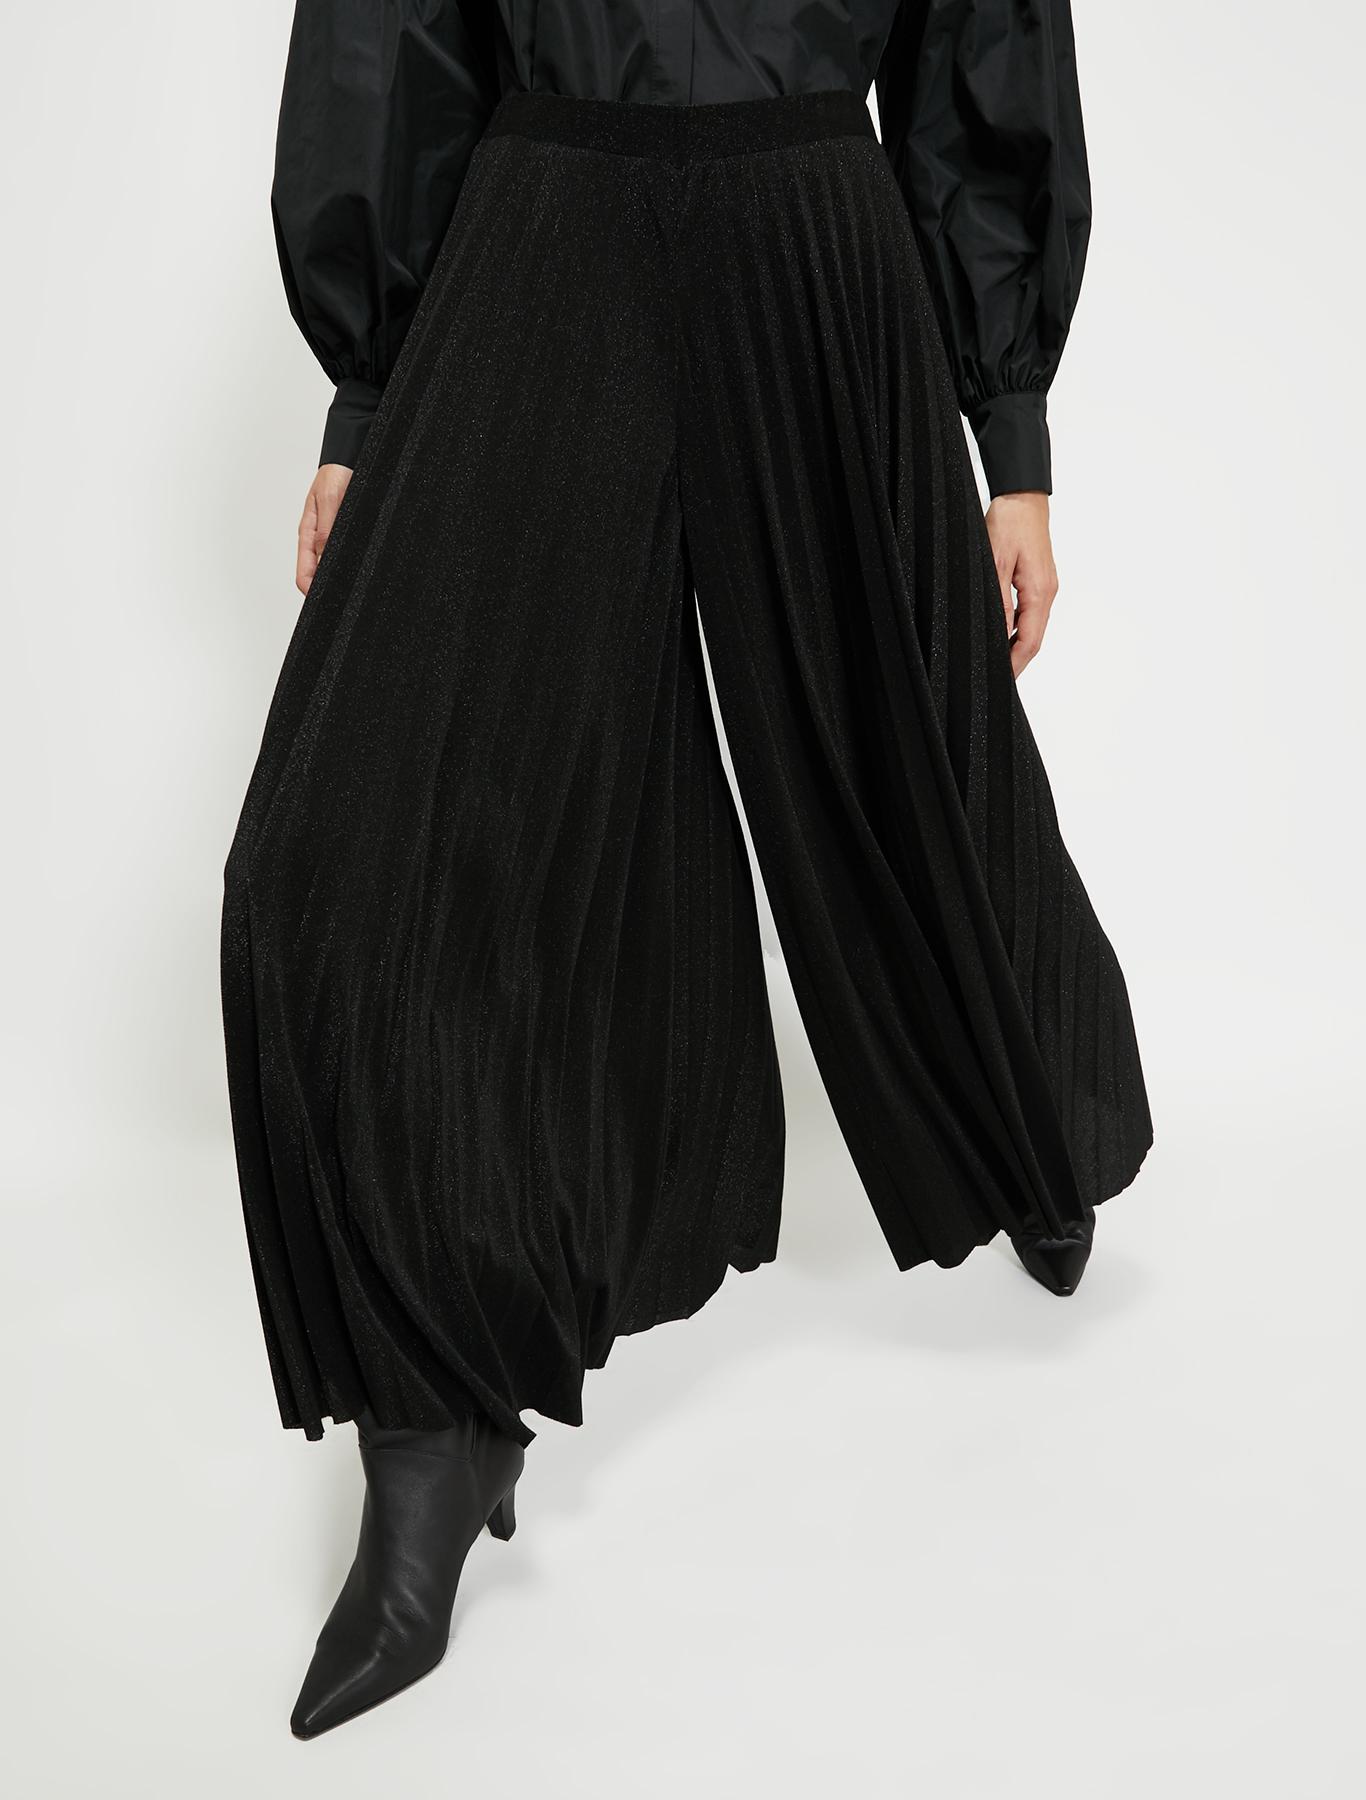 Lamé jersey culottes - black - pennyblack